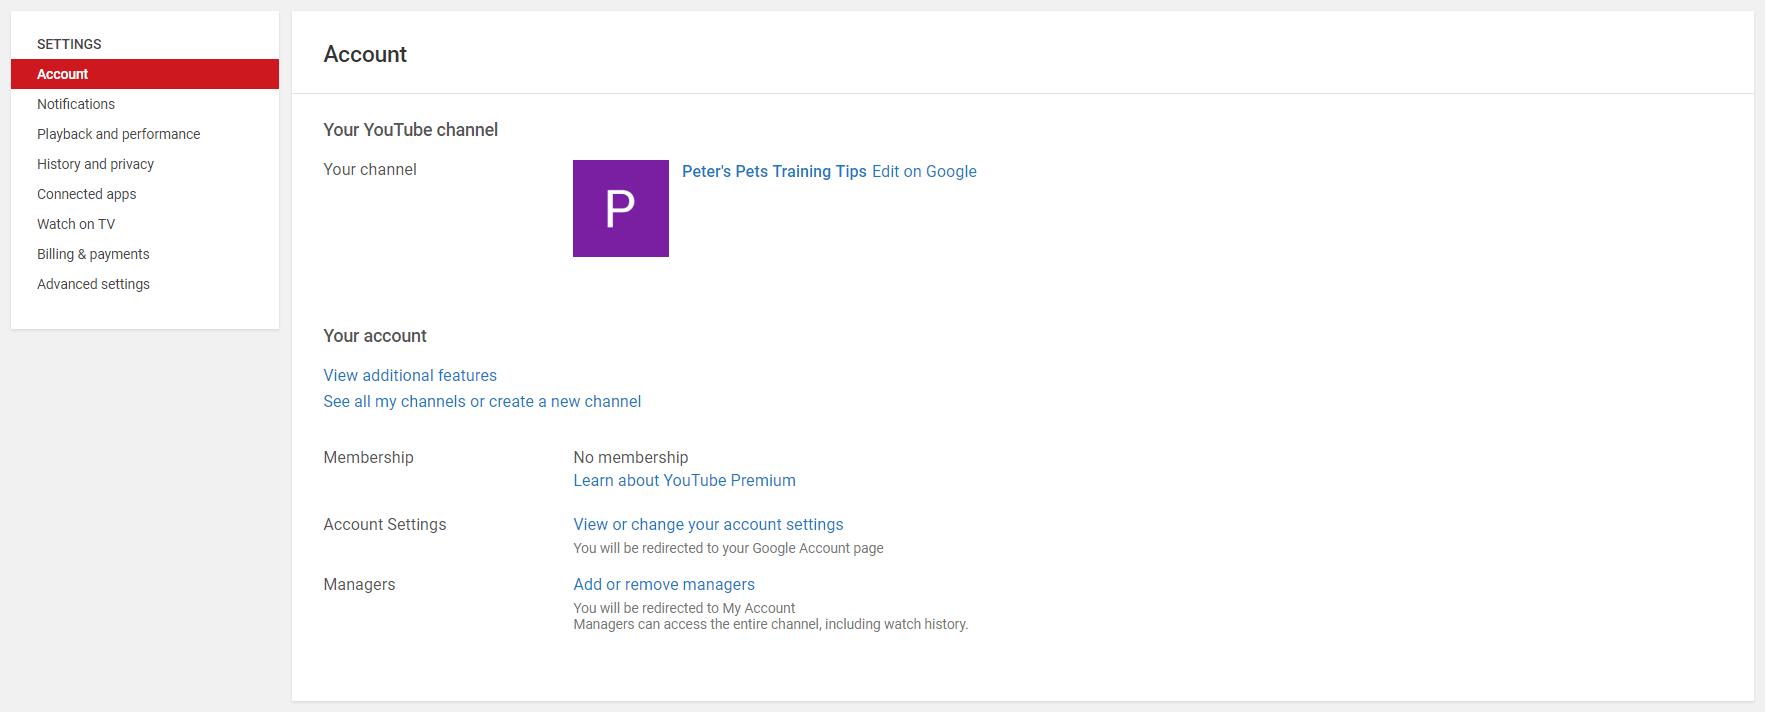 The YouTube account settings menu.